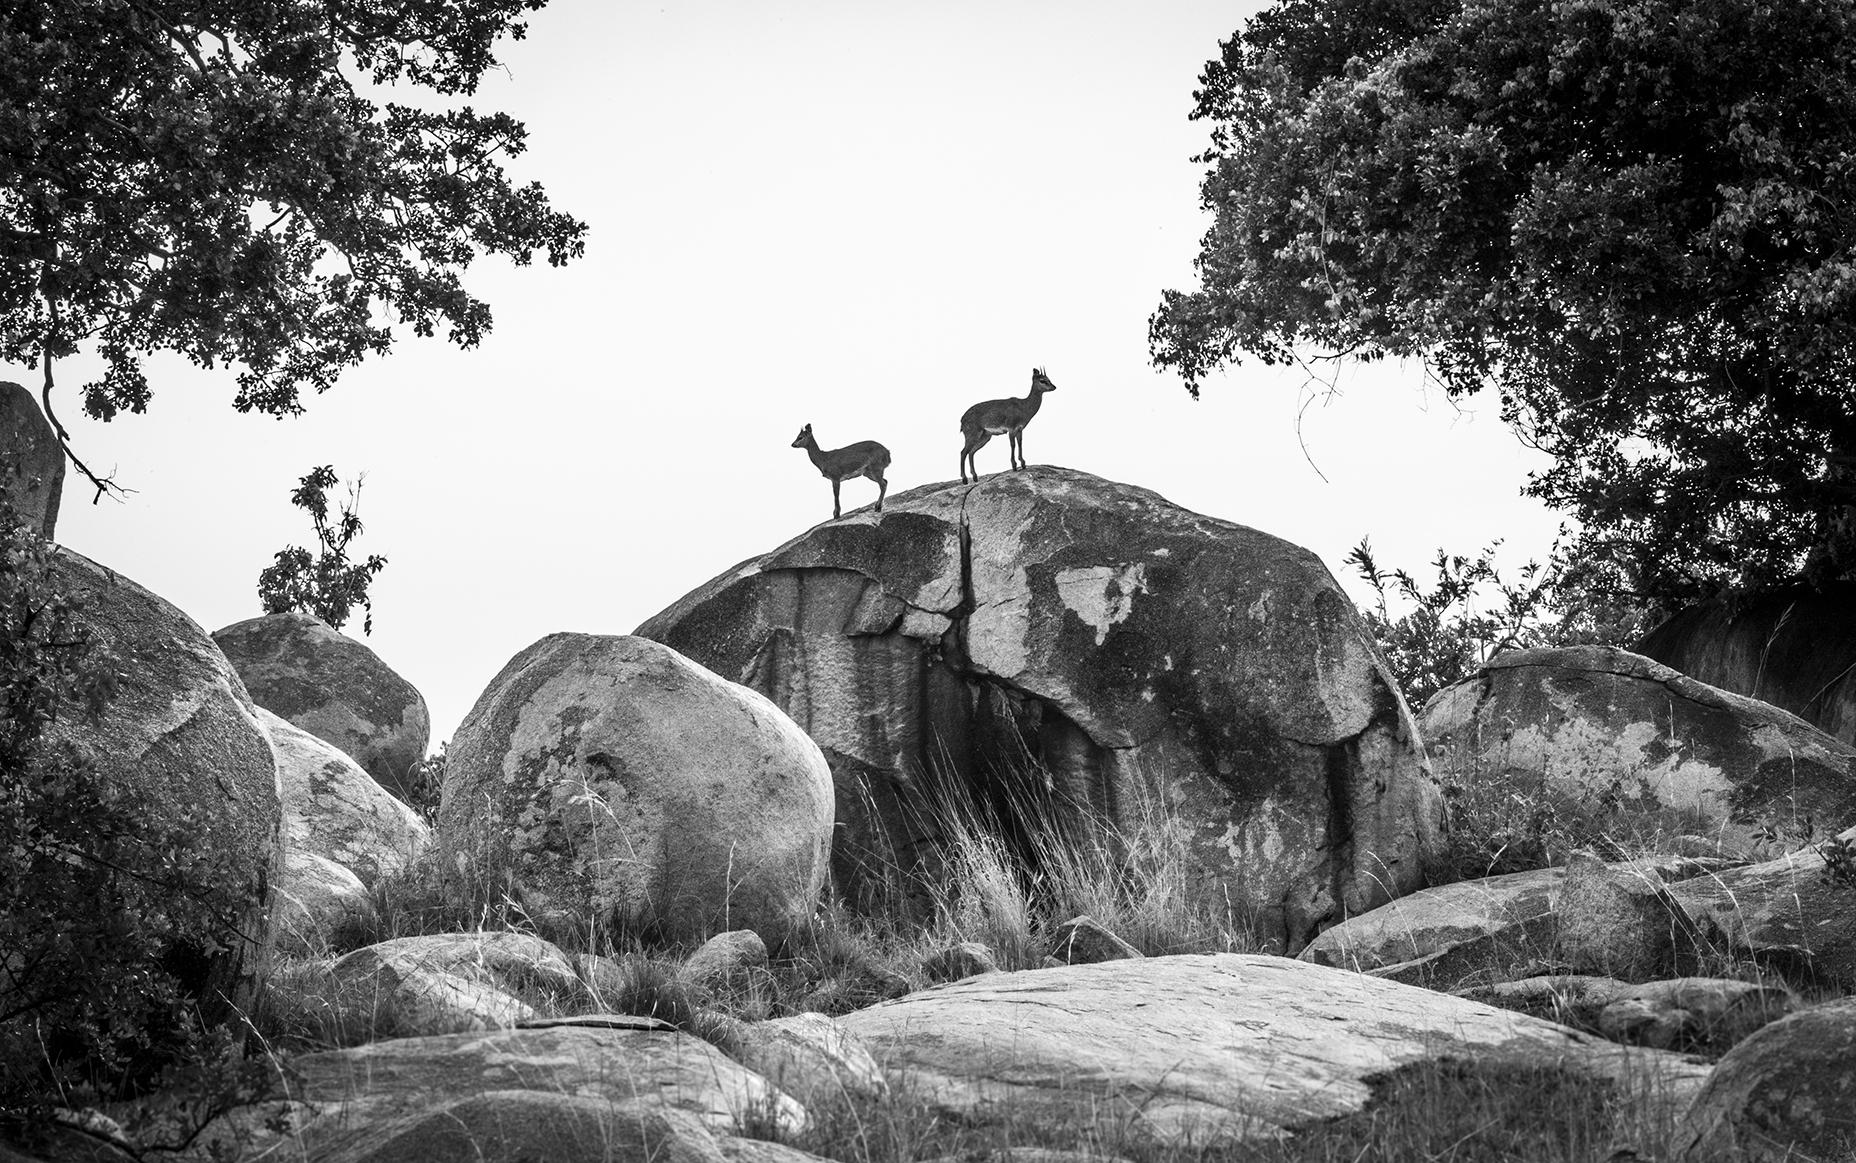 trai anfield photographic safaris -5629_